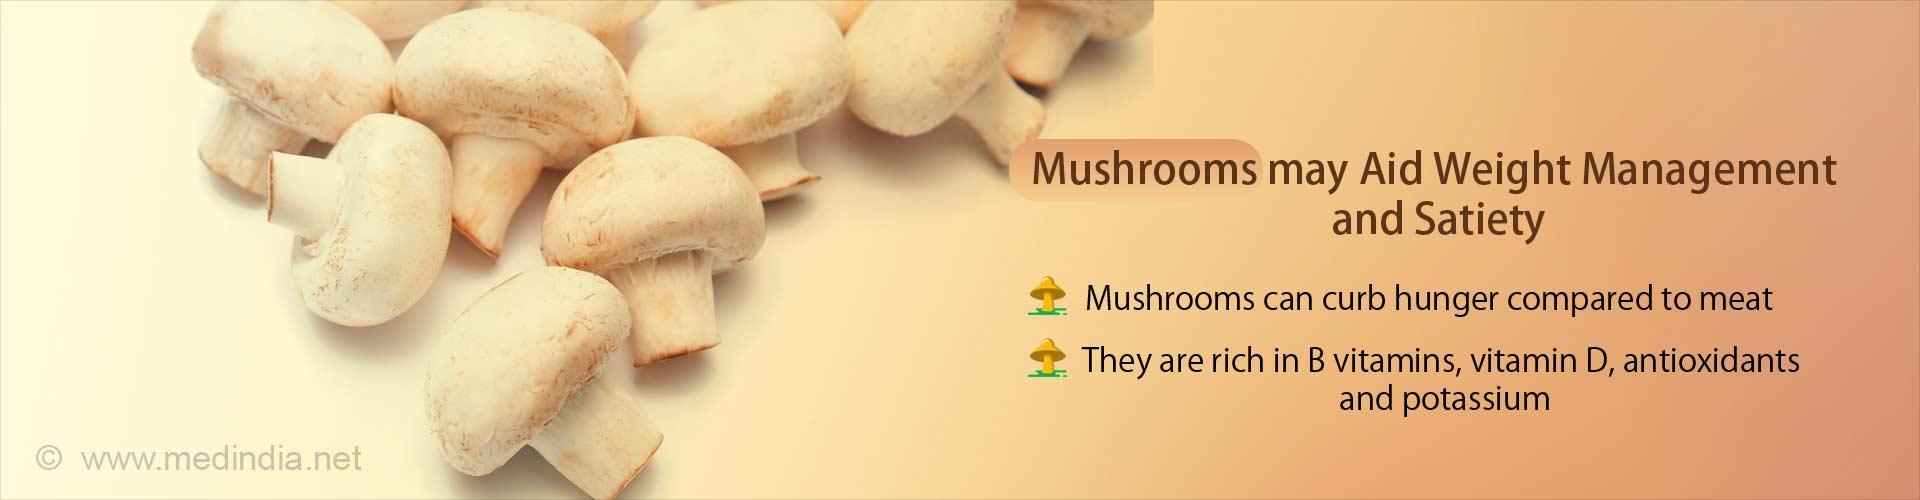 Mushrooms can be as Satiating as Meat